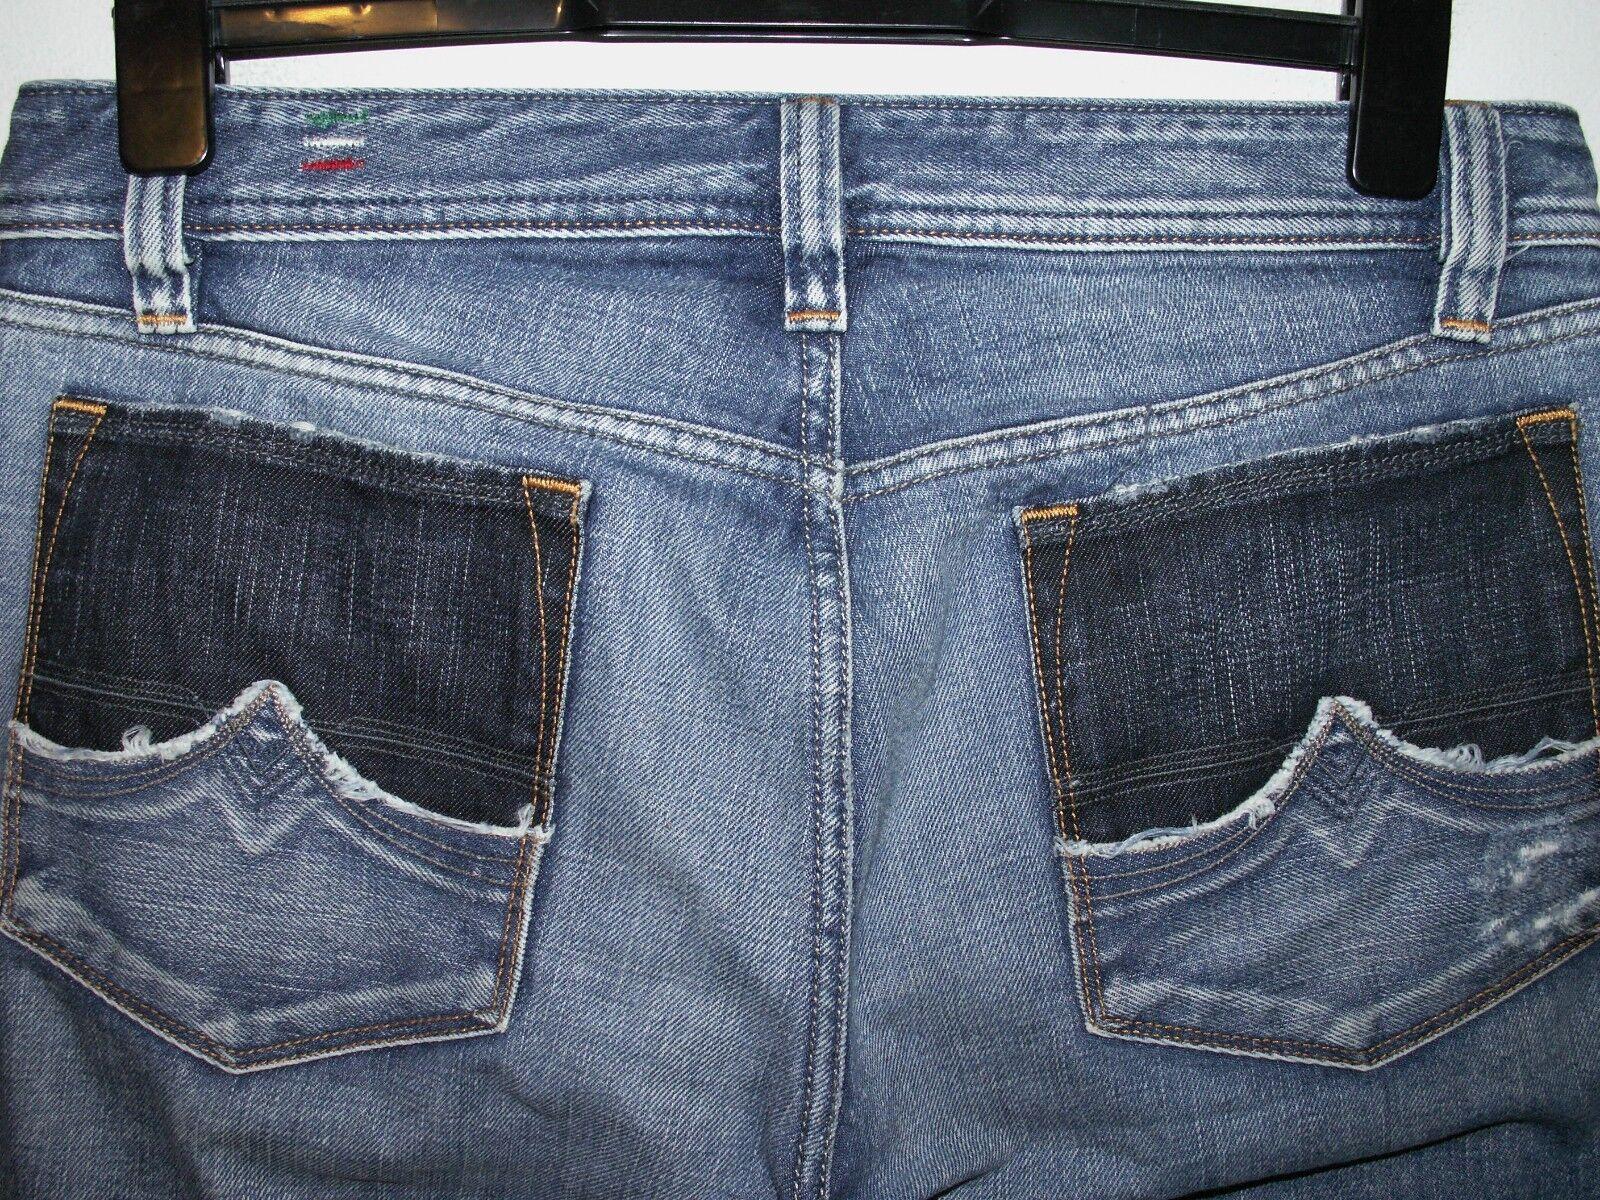 Diesel zaf bootcut jeans wash 00796 W32 L32 (a3781)